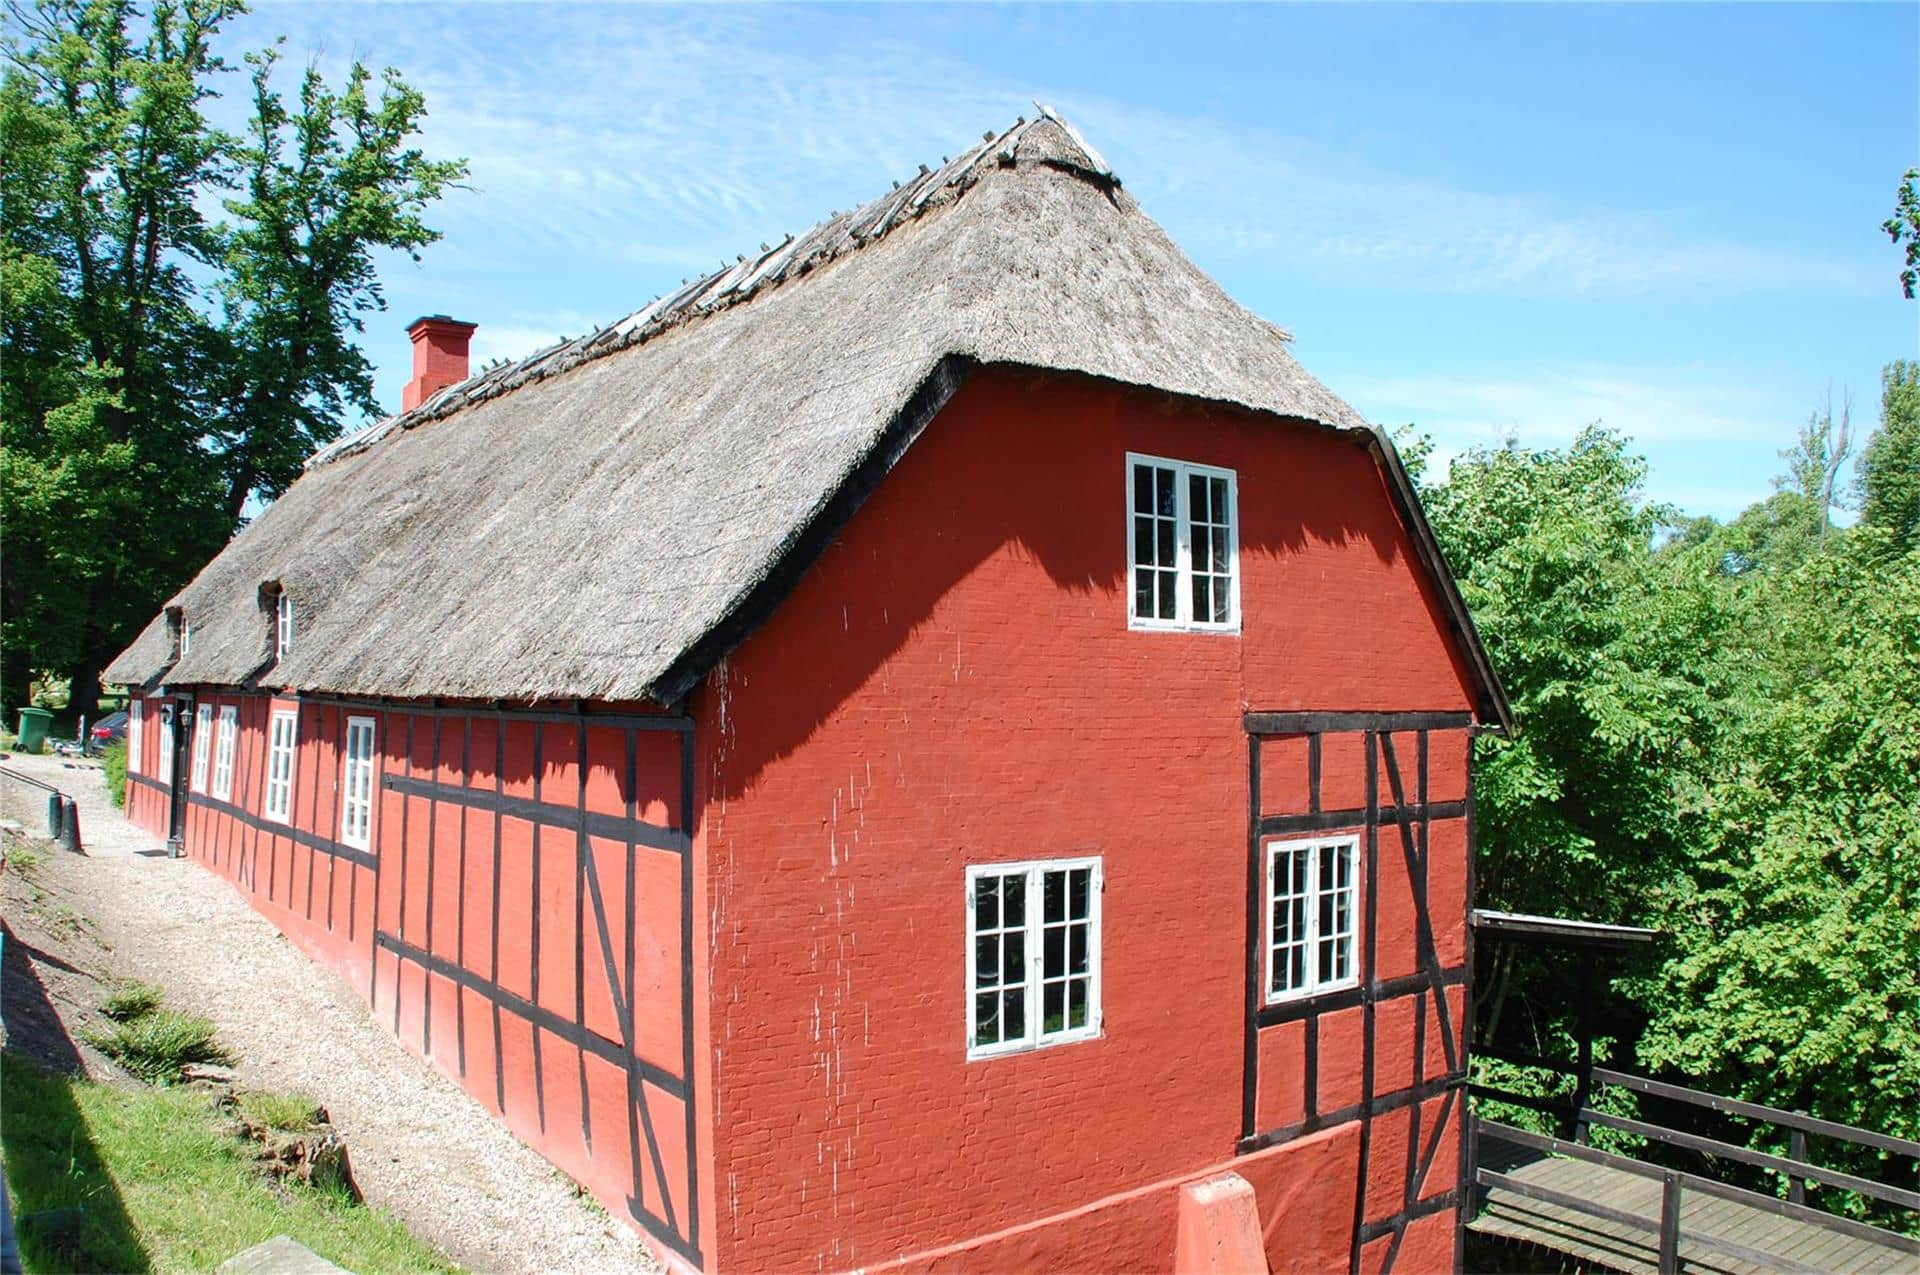 Billede 1-3 Sommerhus M66160, Broholmsvej 35, DK - 5884 Gudme